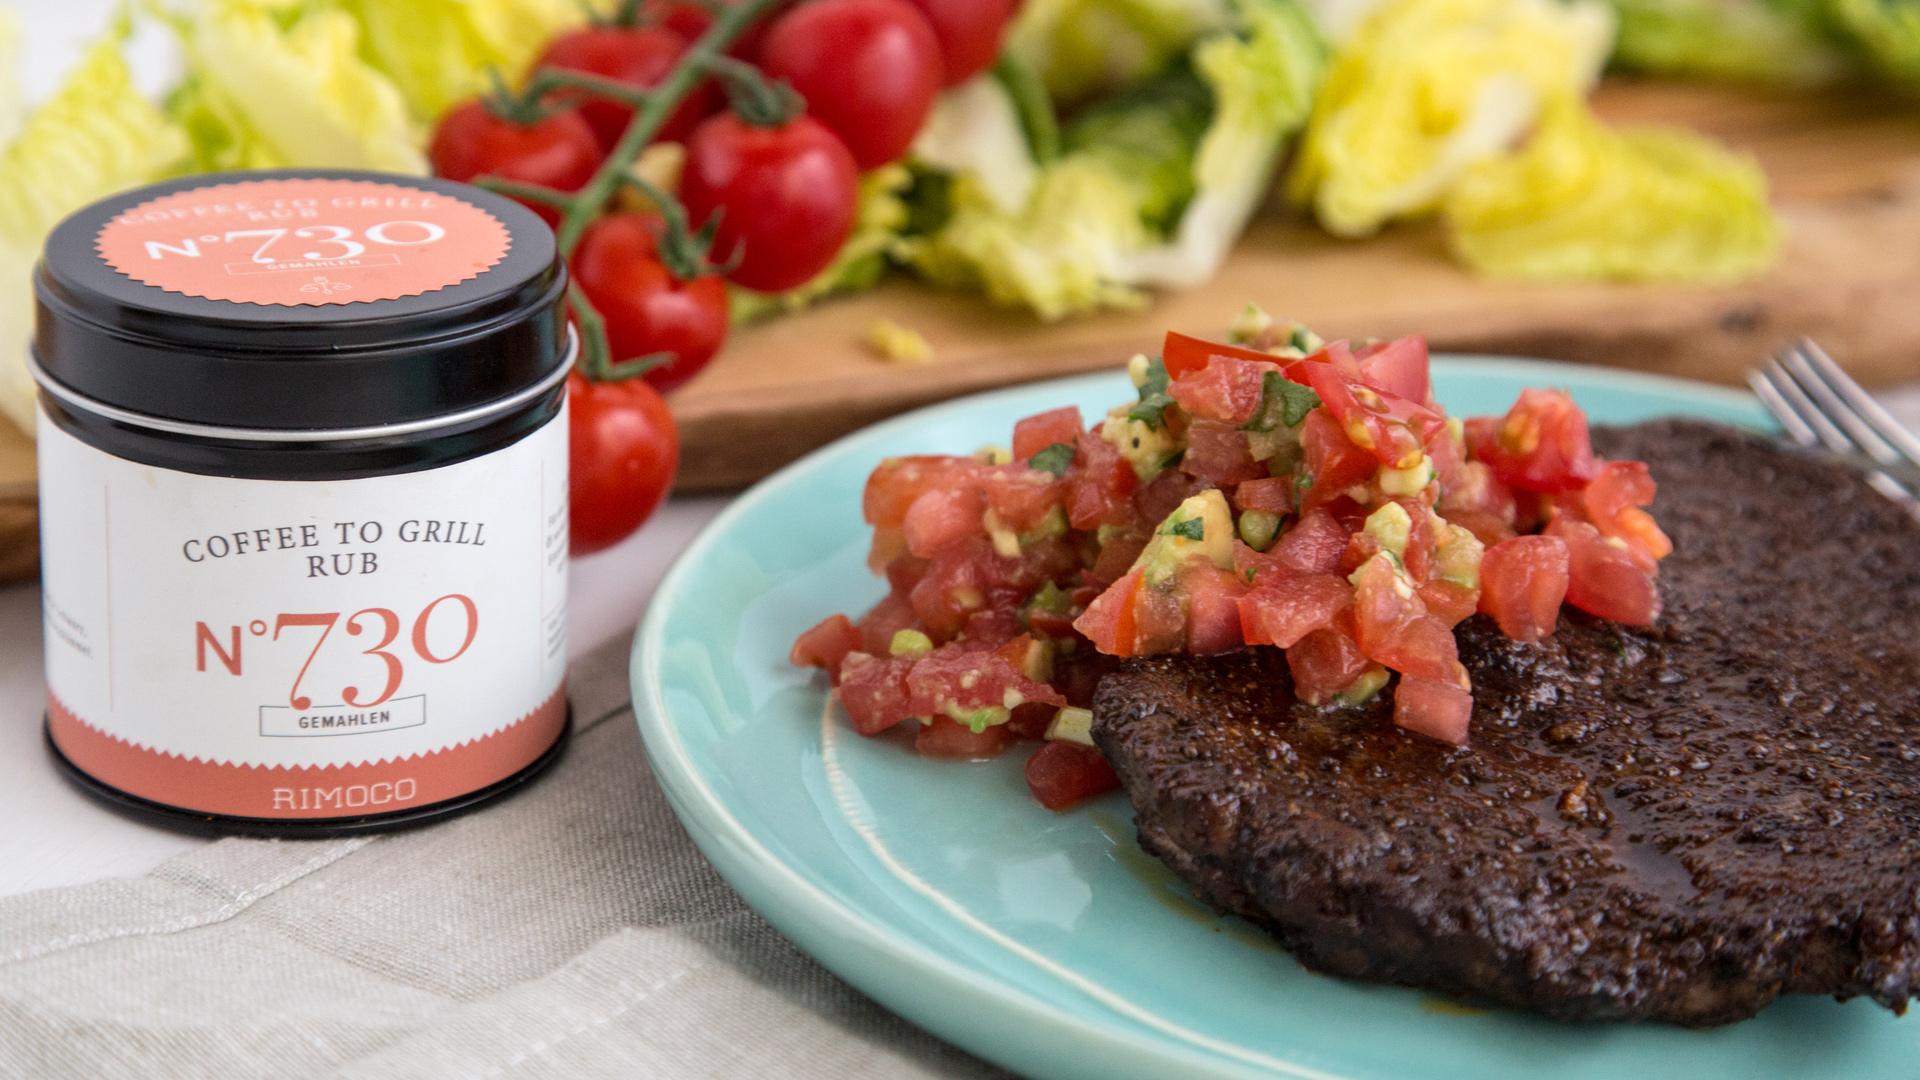 steak-bio-coffee-to-grill-rimoco-16x9